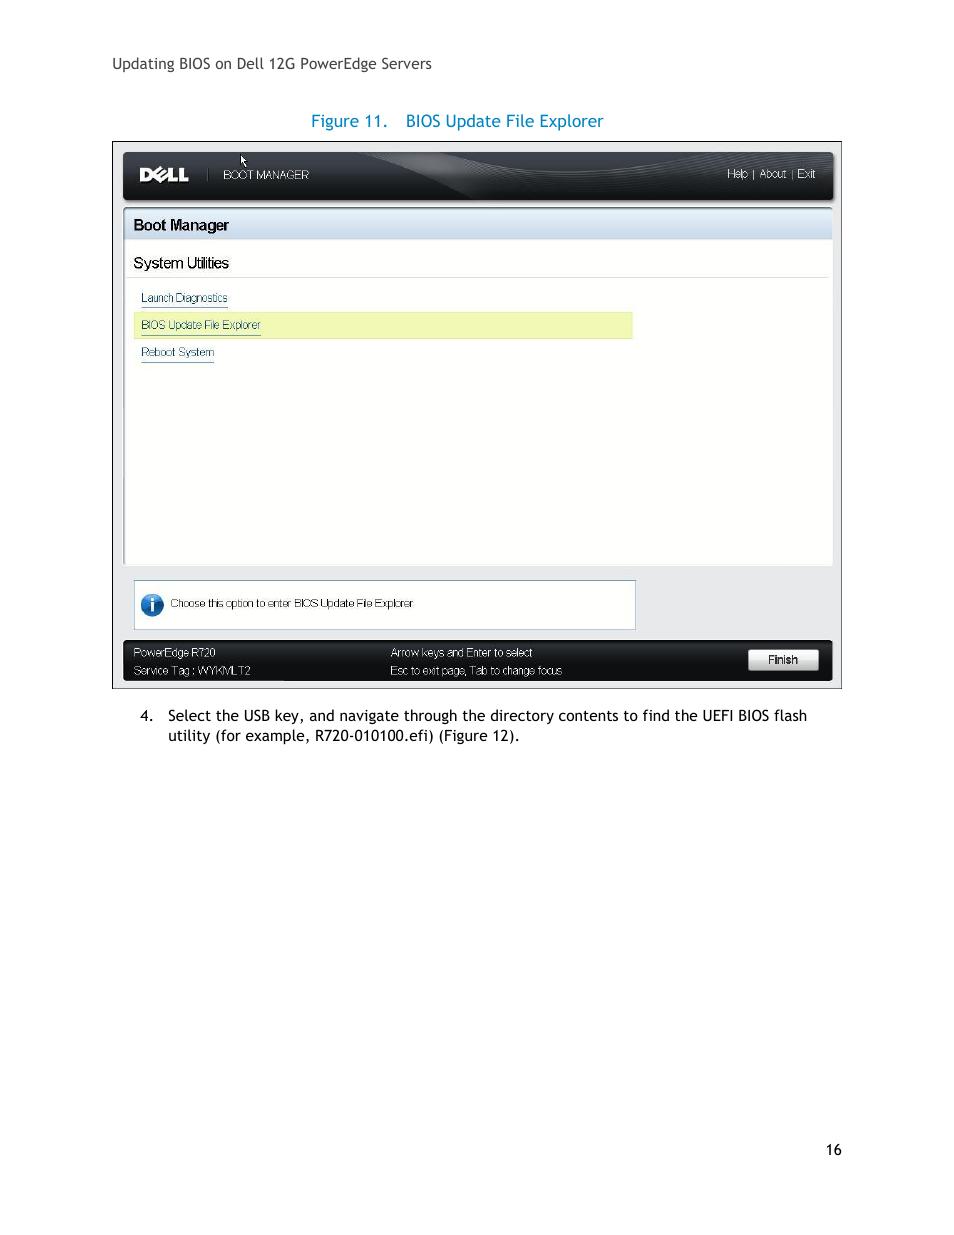 Figure 11, Bios update file explorer | Dell POWEREDGE R620 User